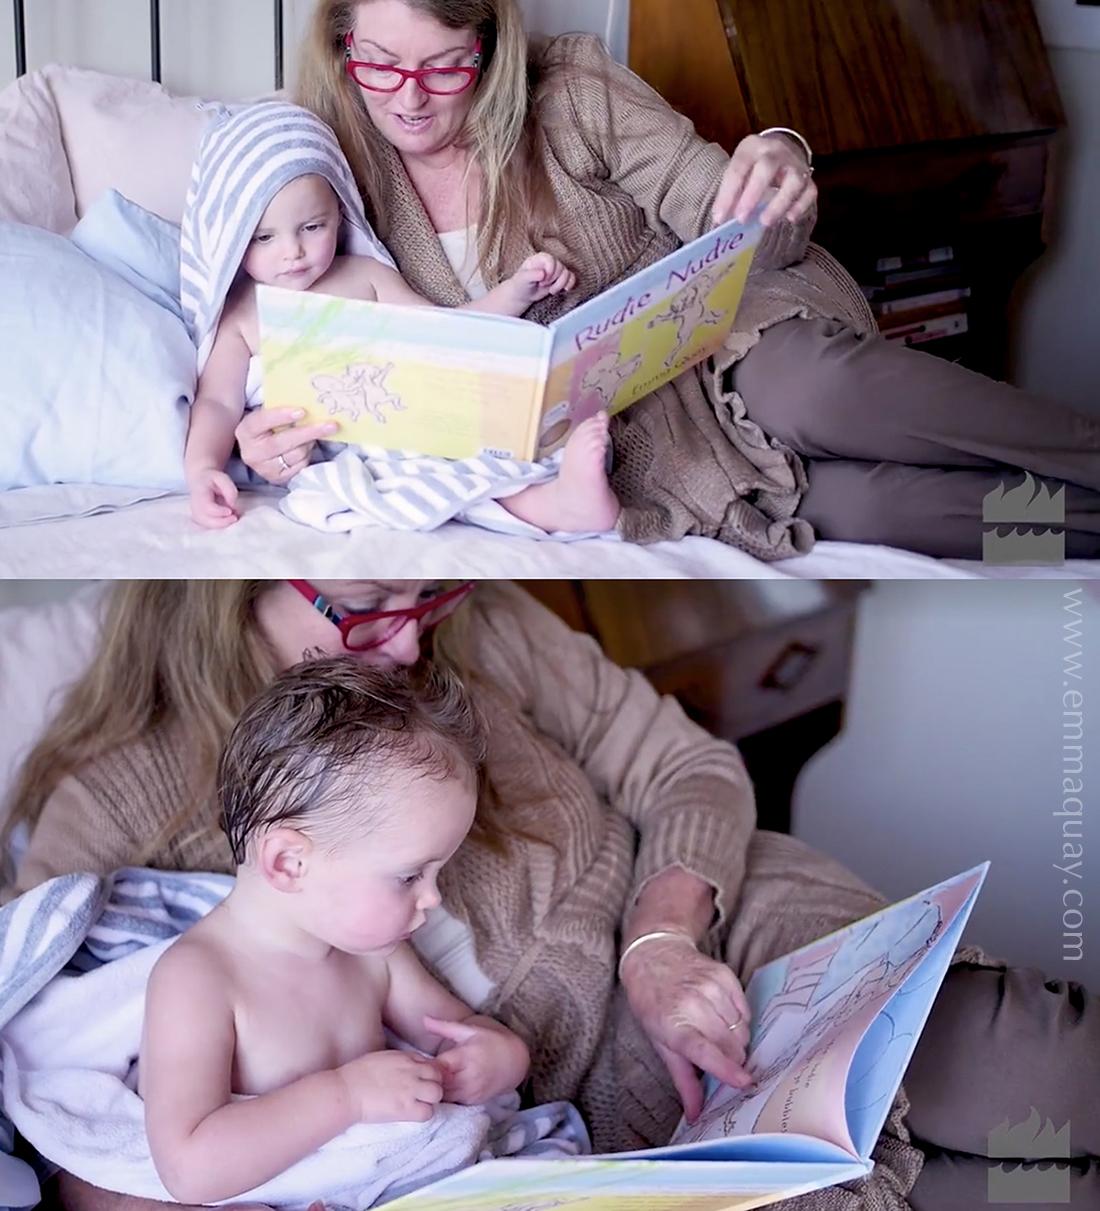 Reading RUDIE NUDIE by Emma Quay(ABC Books) •http://www.emmaquay.com